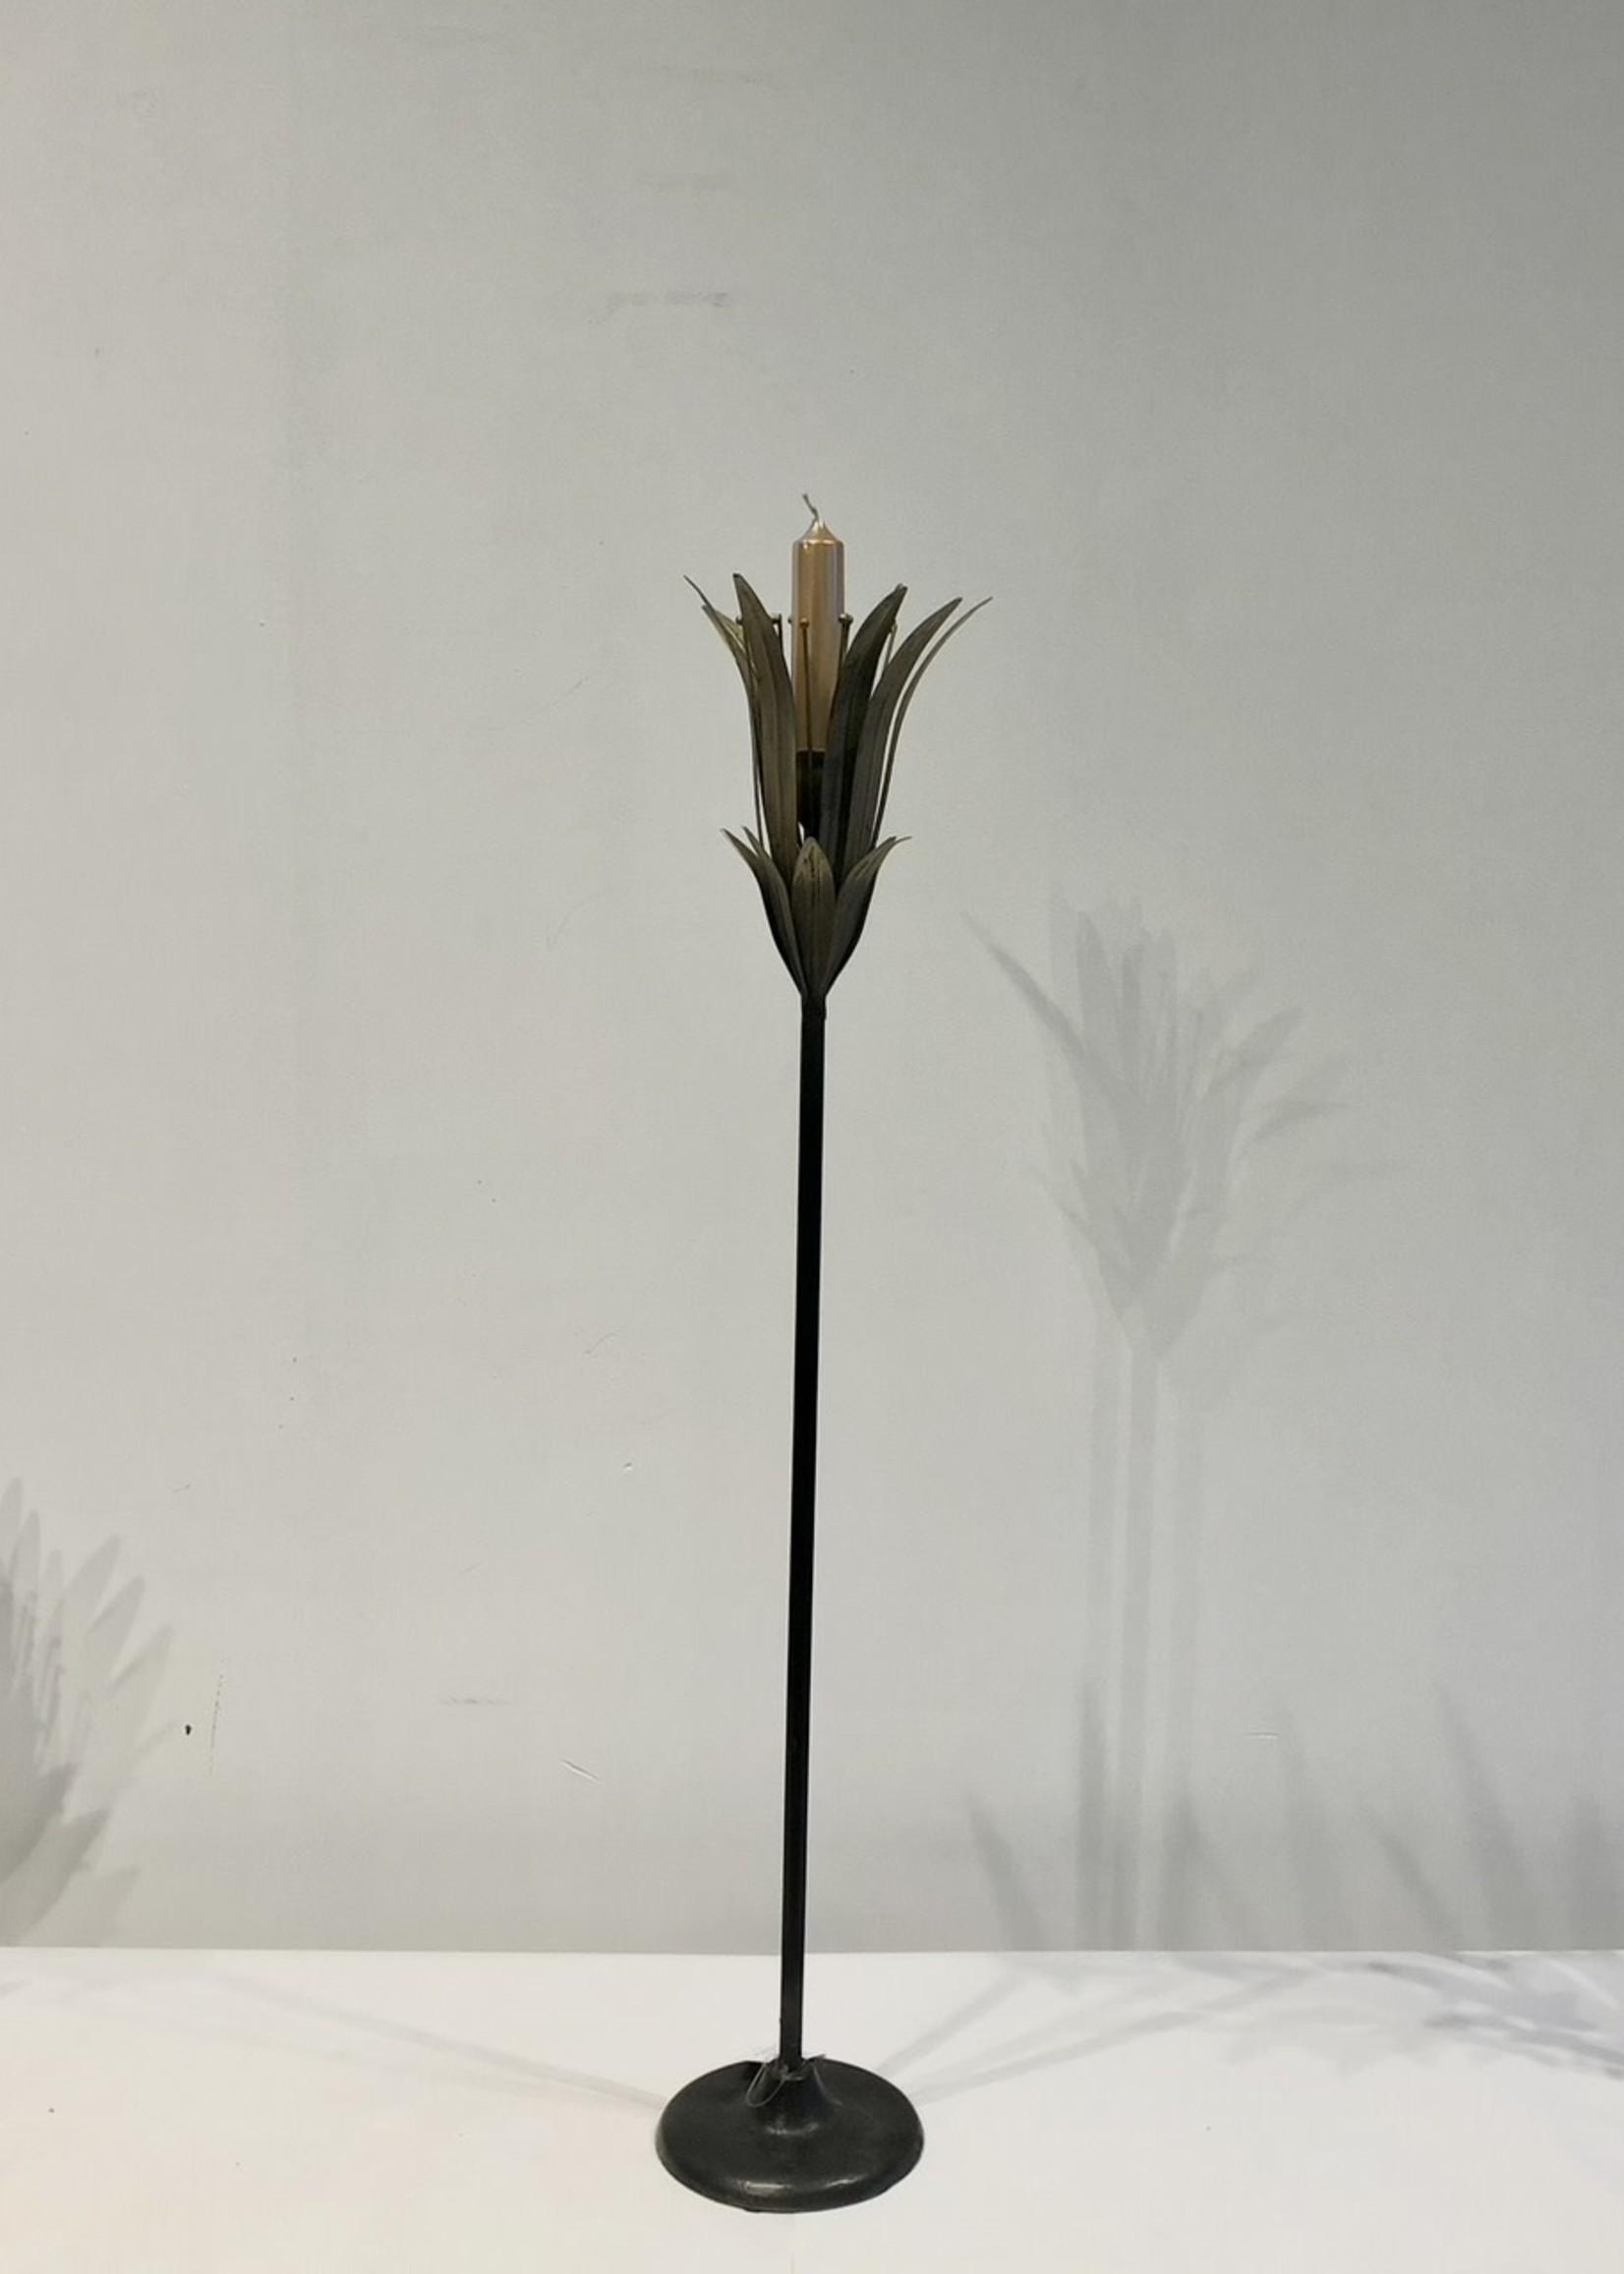 ShiShi Kandelaar LELIE Large 68 cm